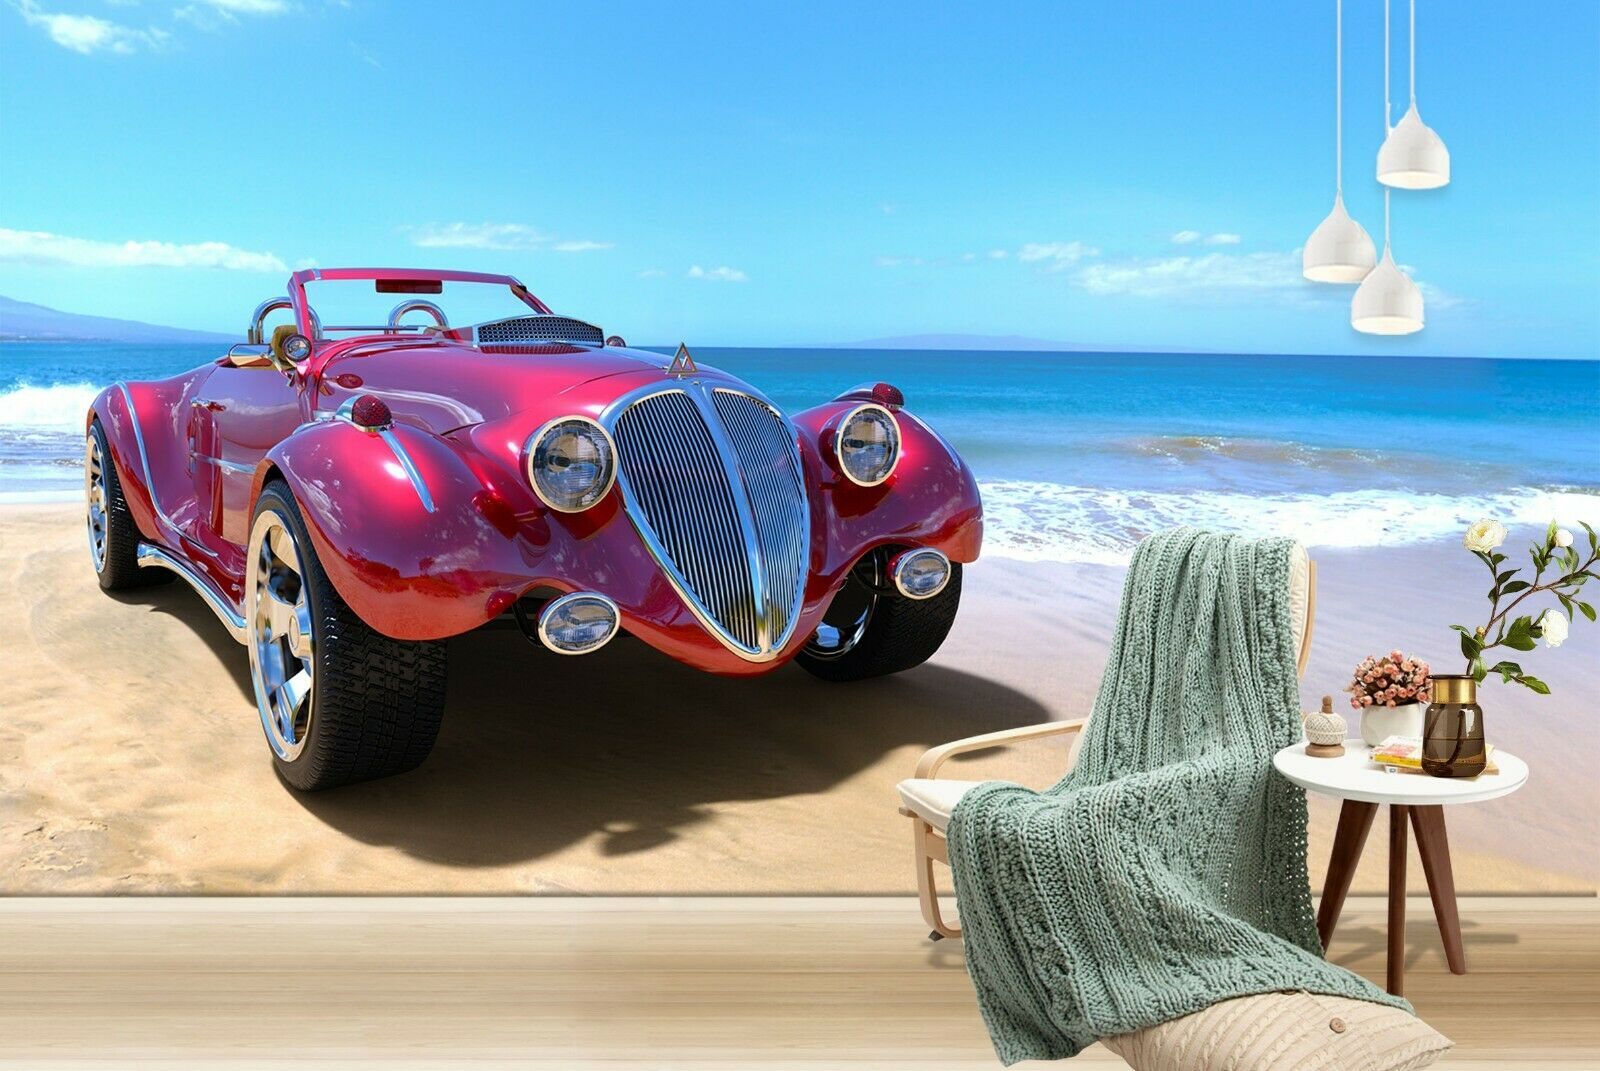 3D Seaside rot Car I152 Transport Wallpaper Mural Sefl-adhesive Removable An